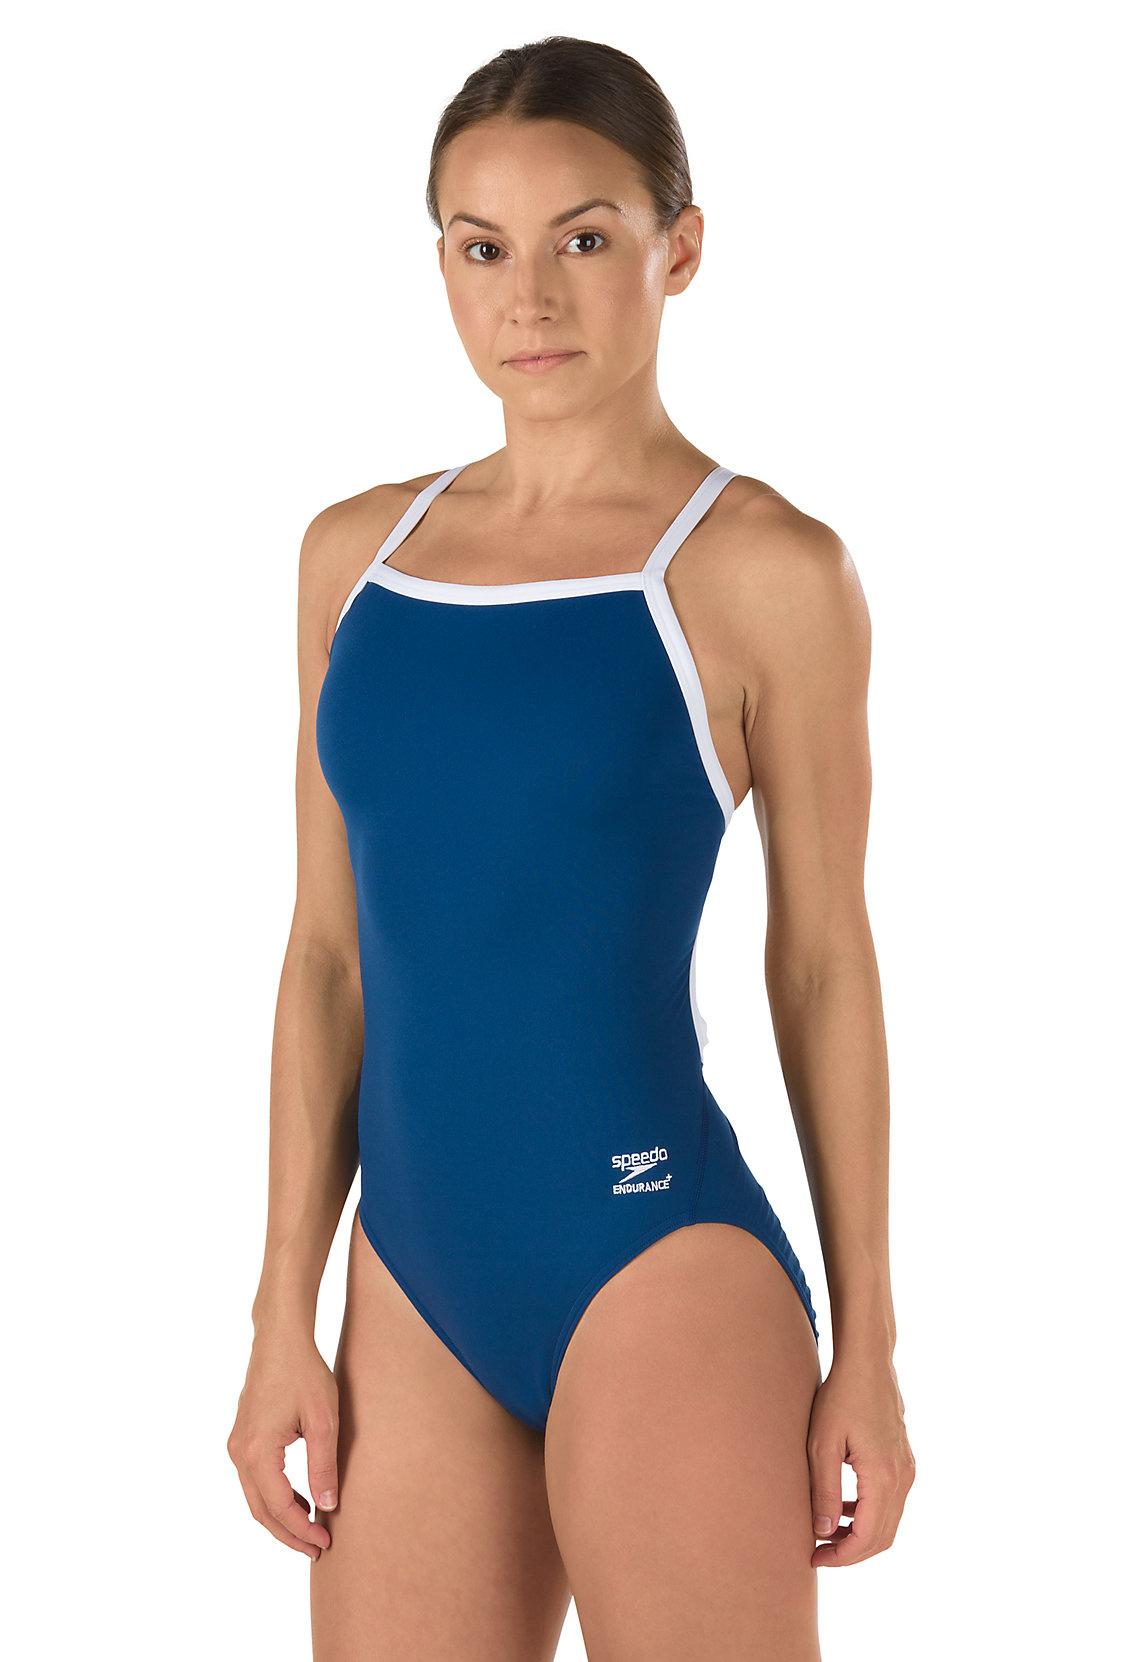 the finals workout Speedo bikini solid